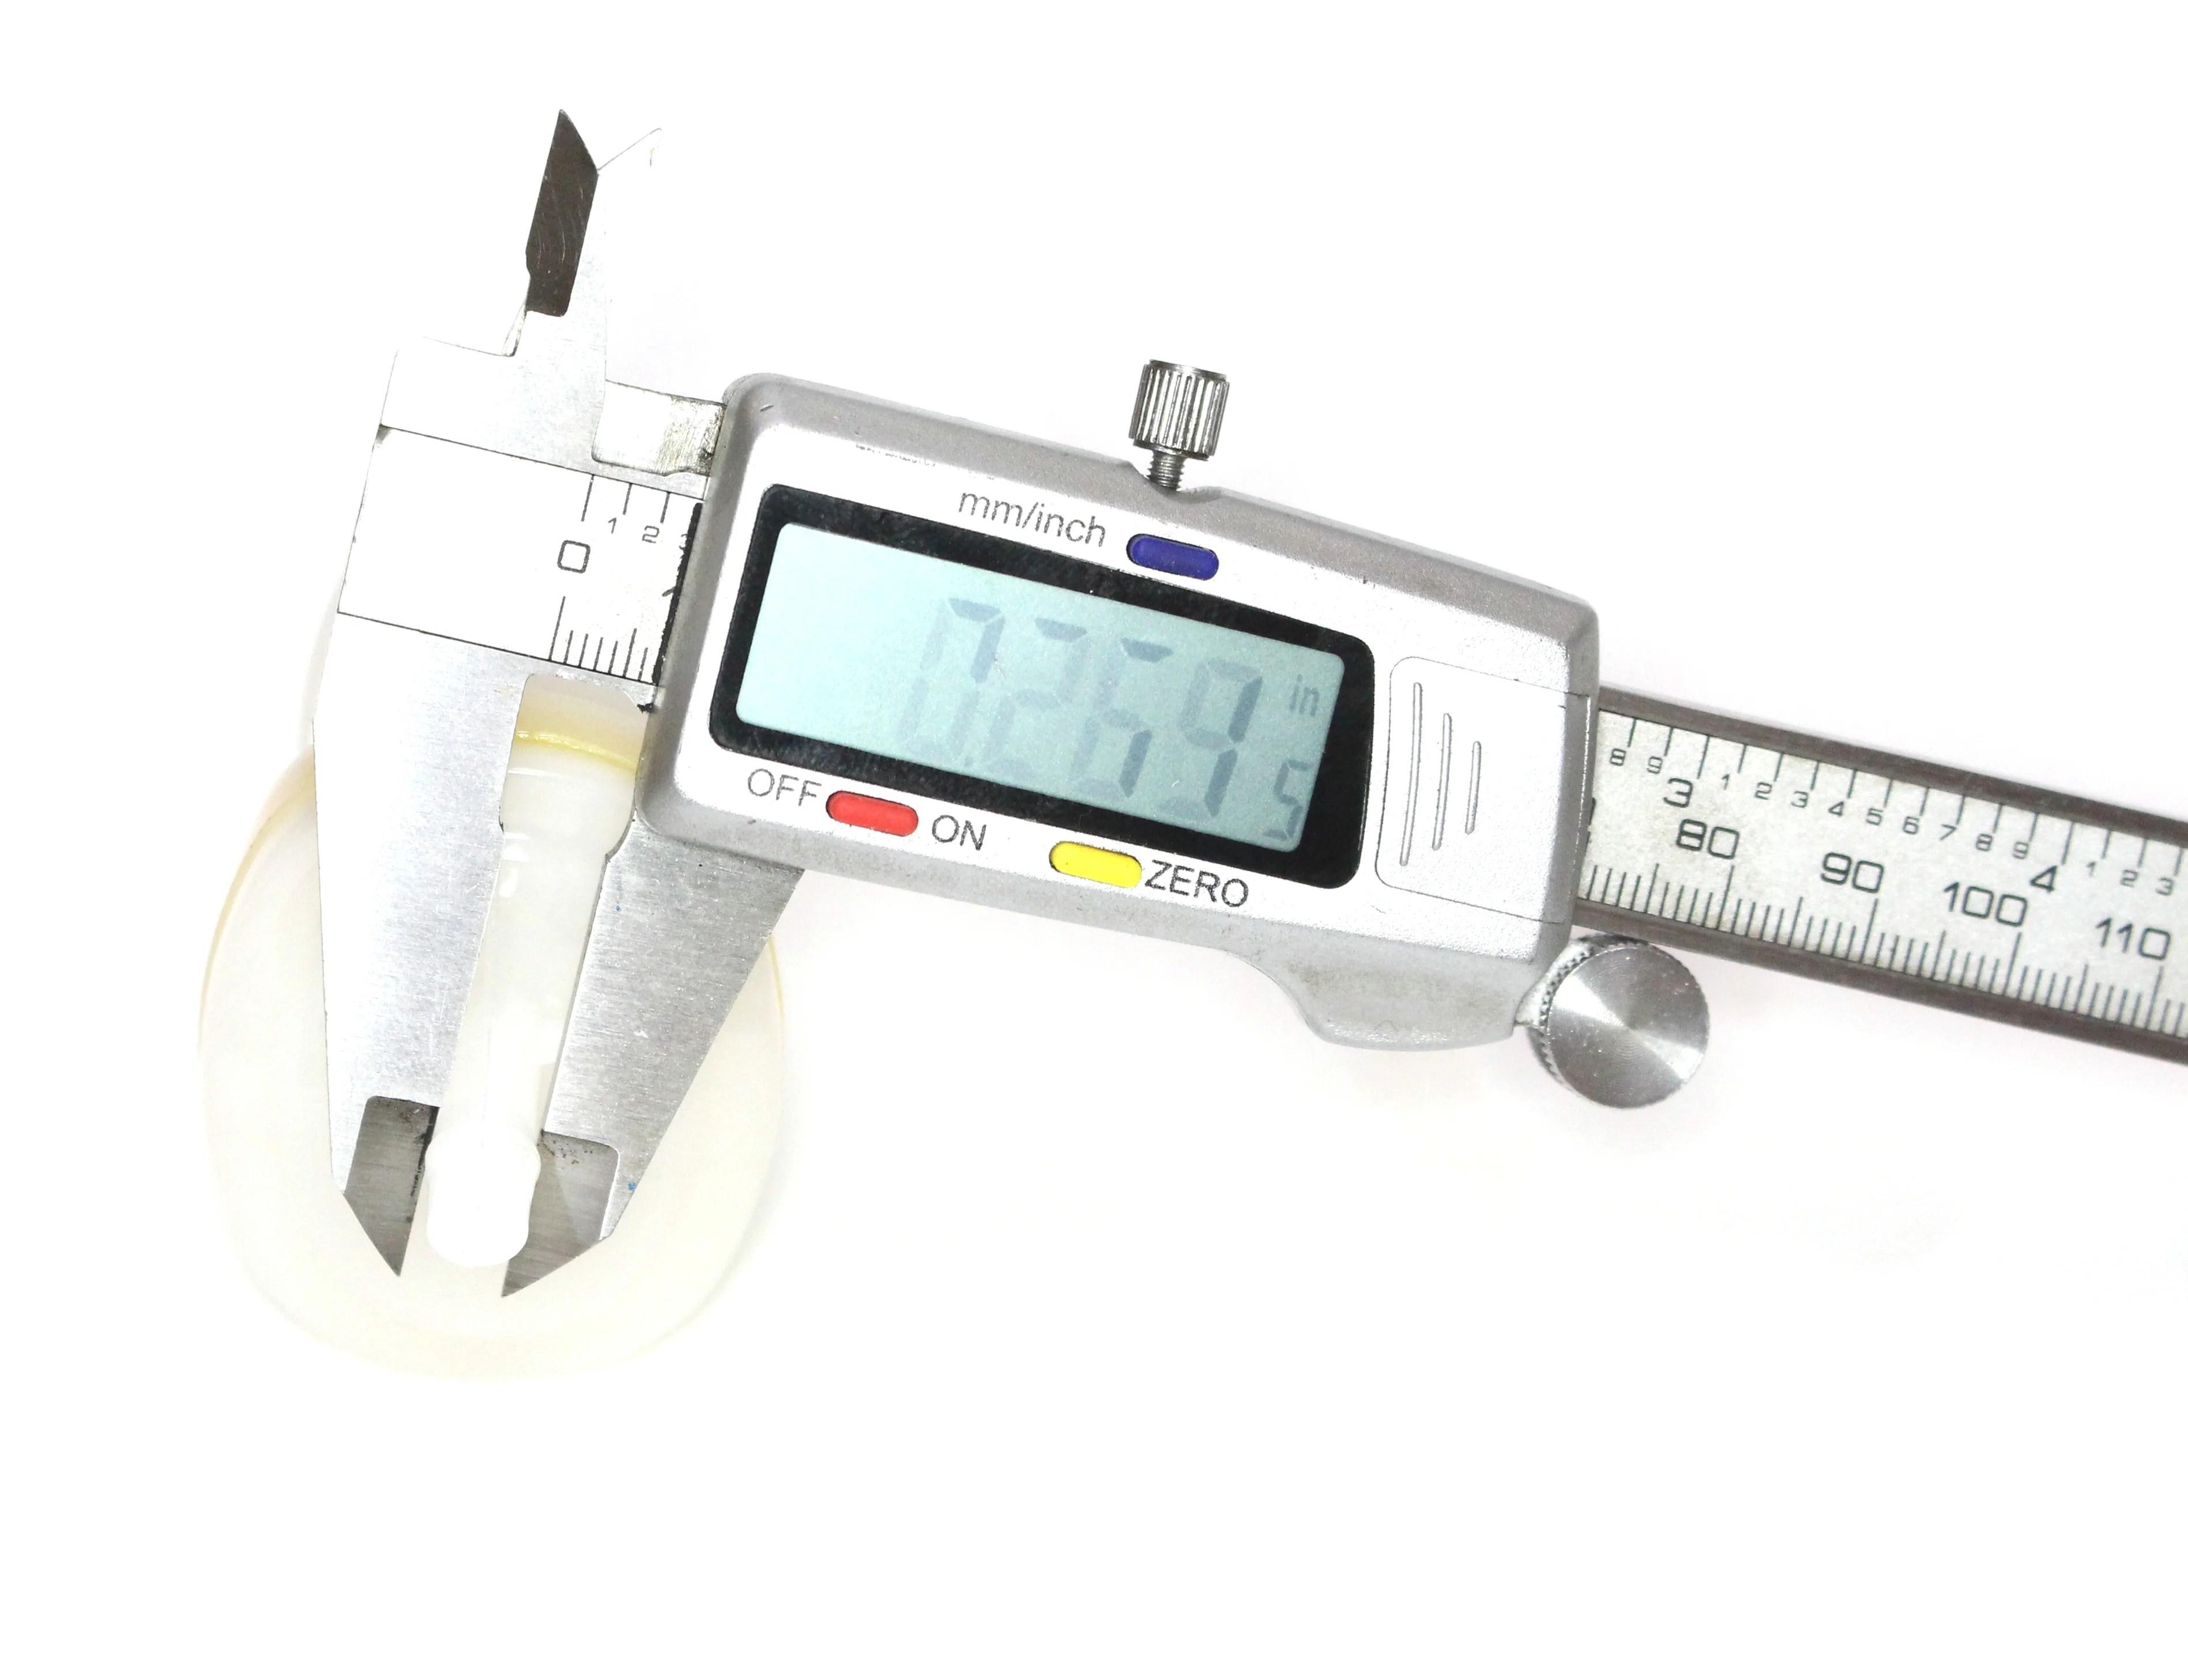 hight resolution of  yamaha pwc waverunner gas fuel filter 6k8 24560 10 00 6k8 24560